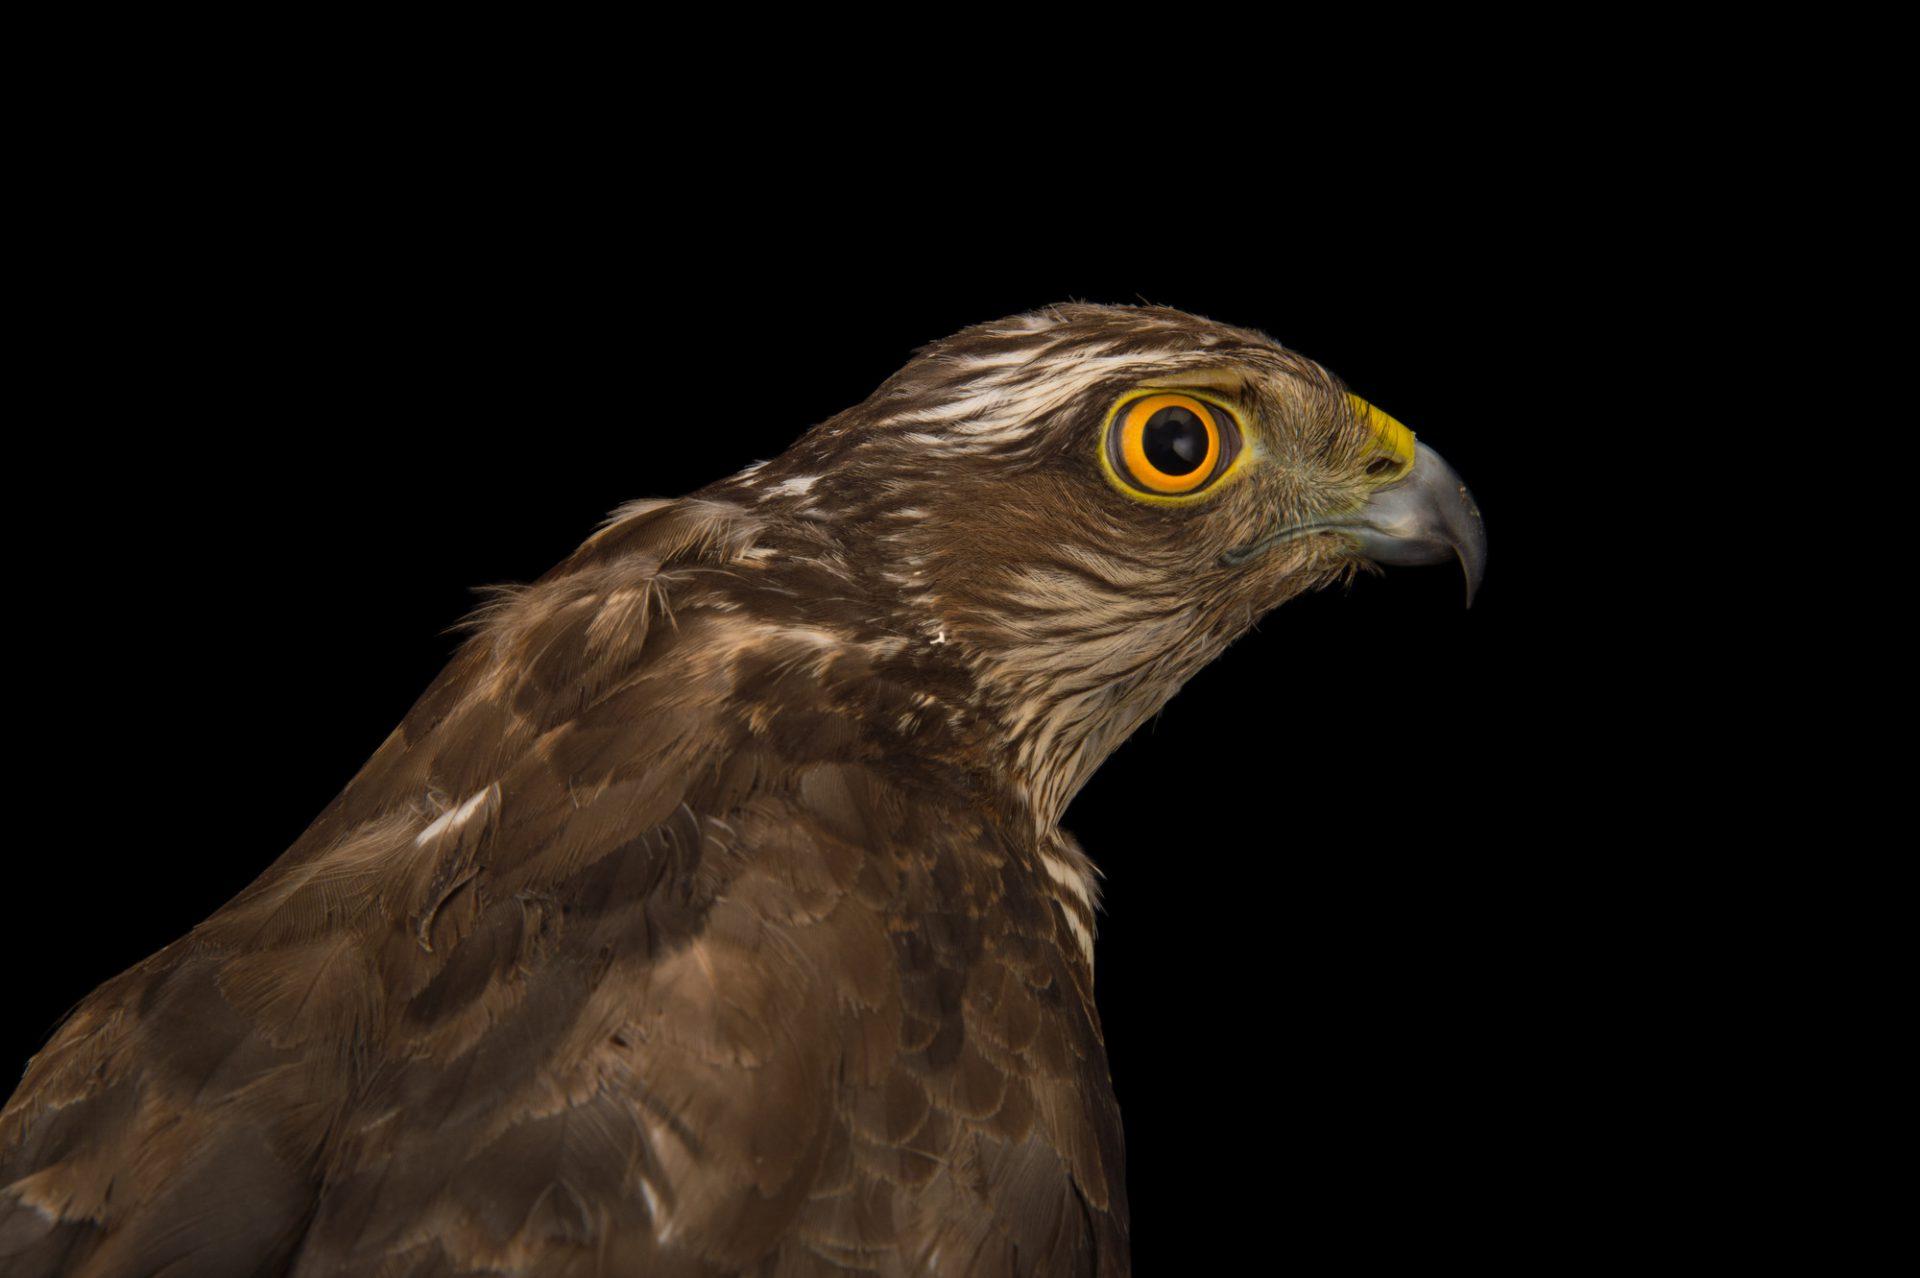 Photo: Eurasian sparrowhawk (Accipiter nisus) at the Budapest Zoo.